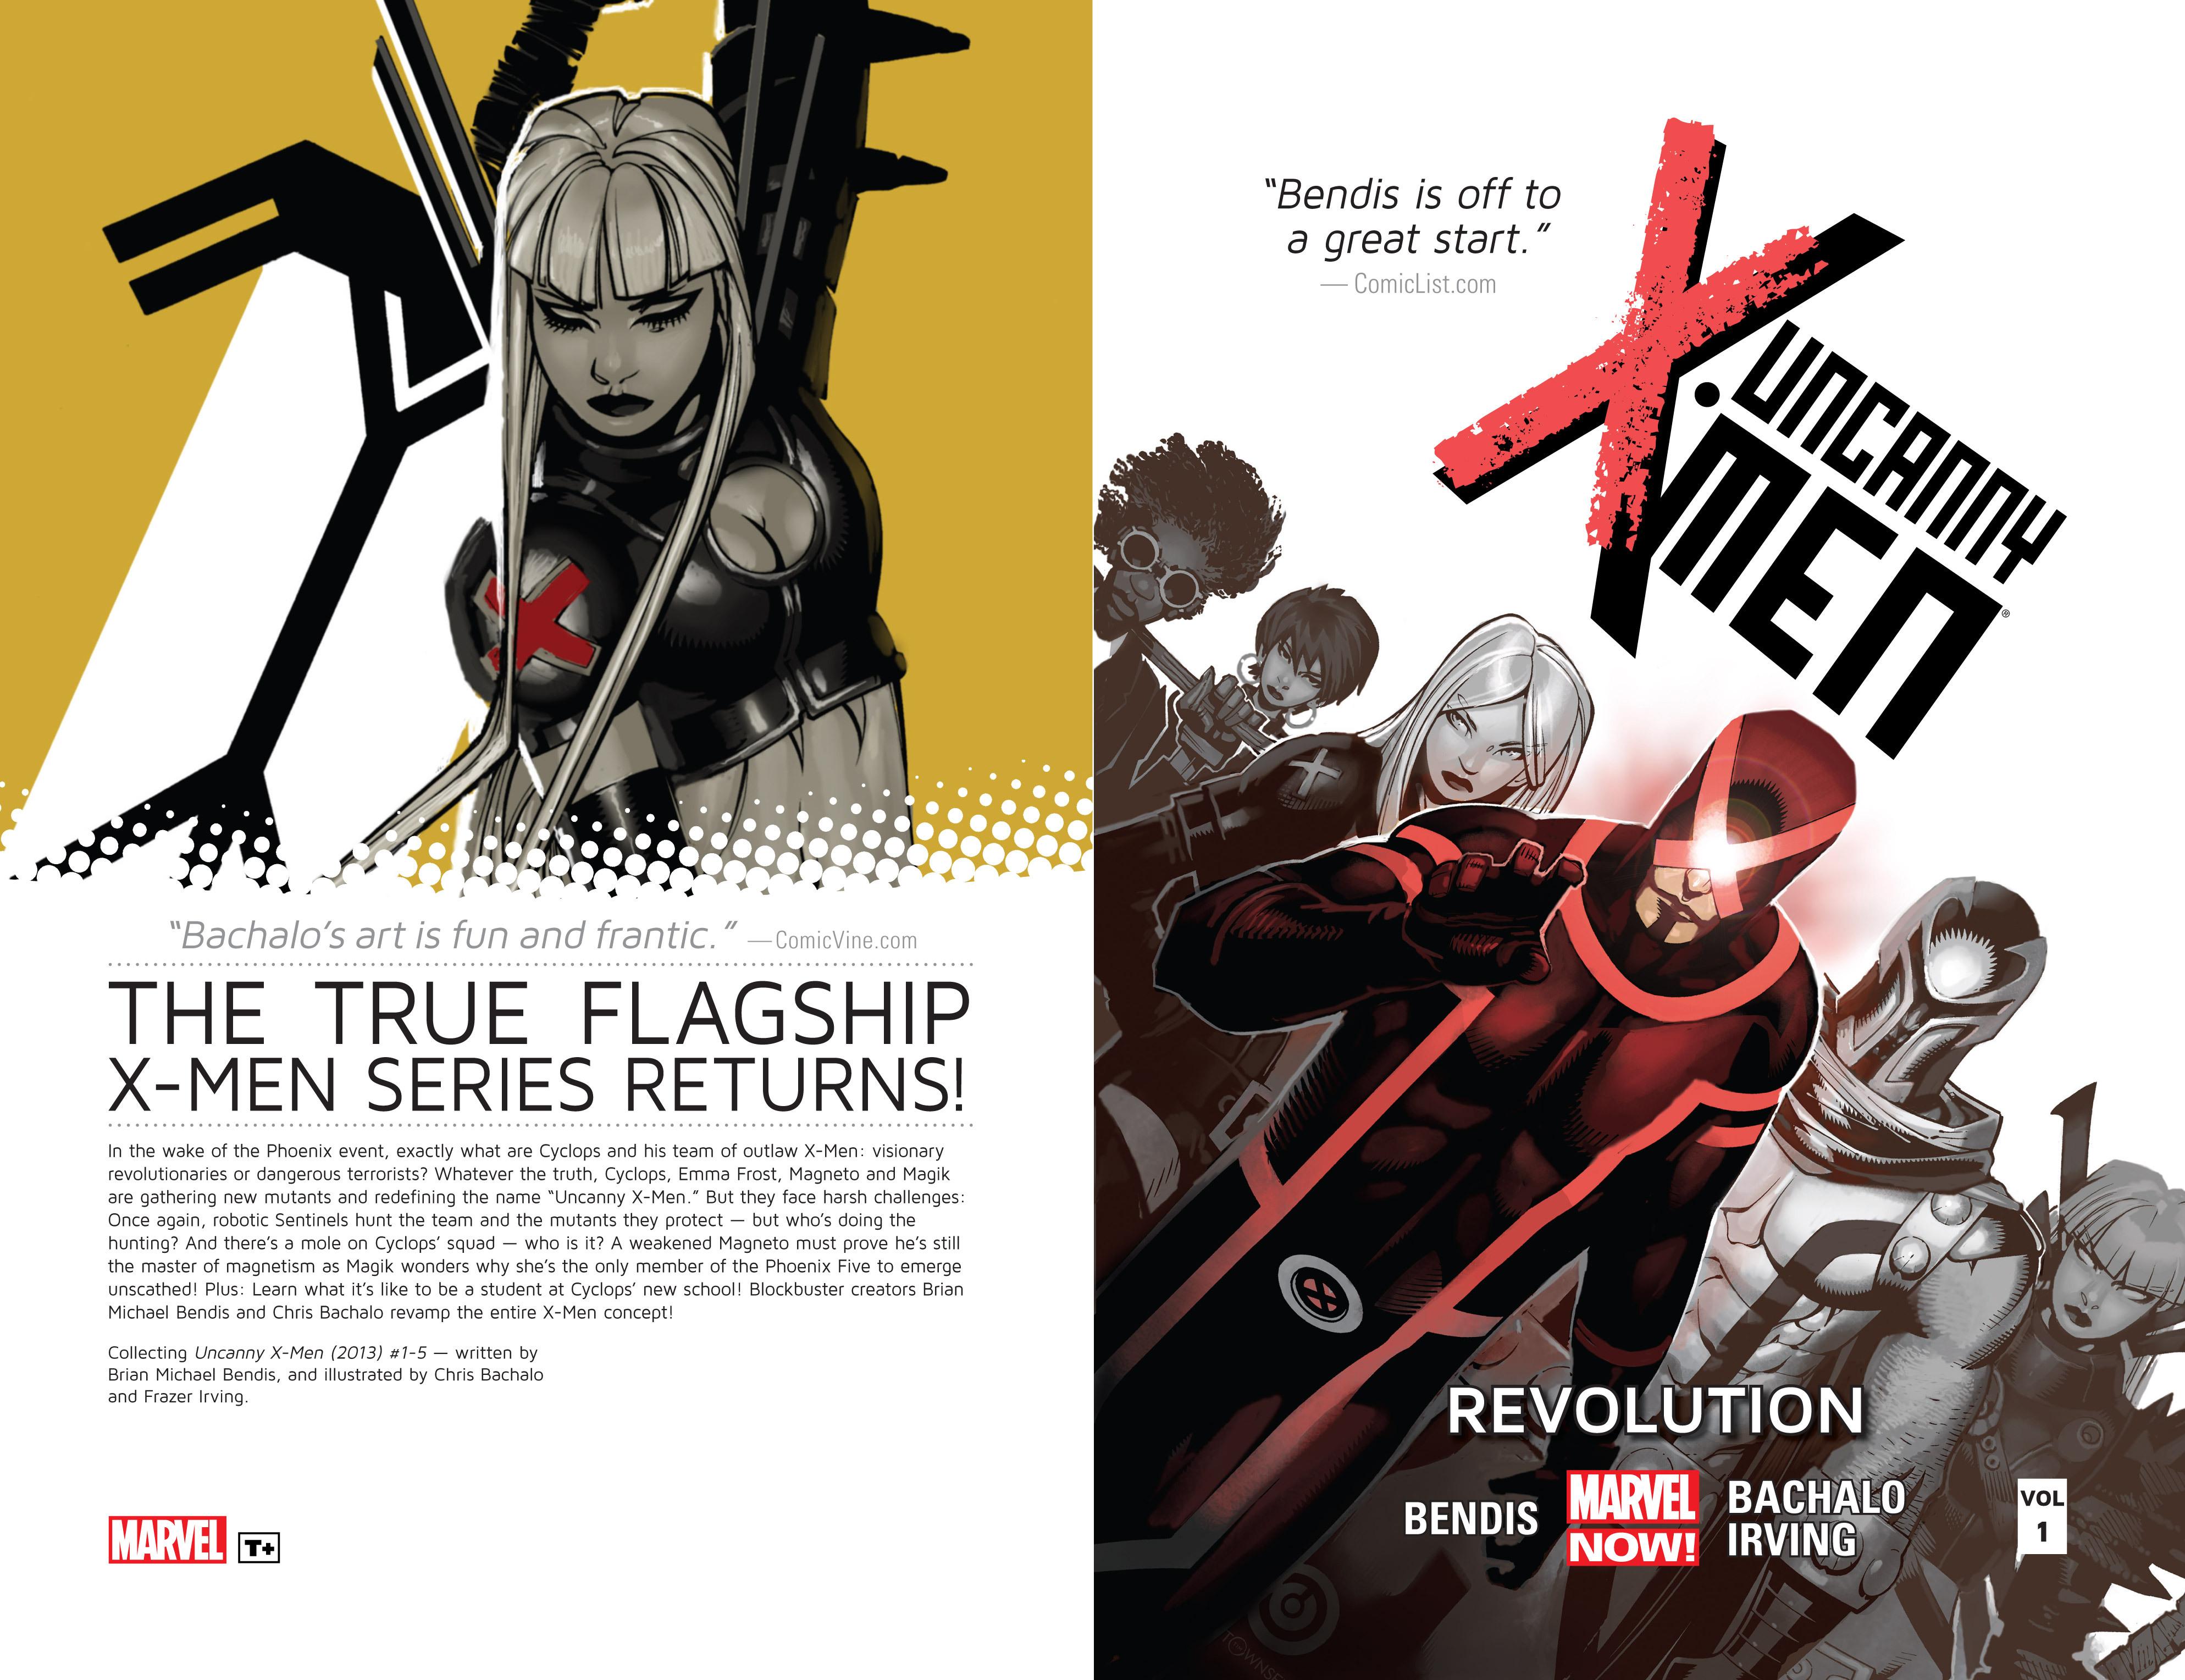 Read online Uncanny X-Men (2013) comic -  Issue # _TPB 1 - Revolution - 2